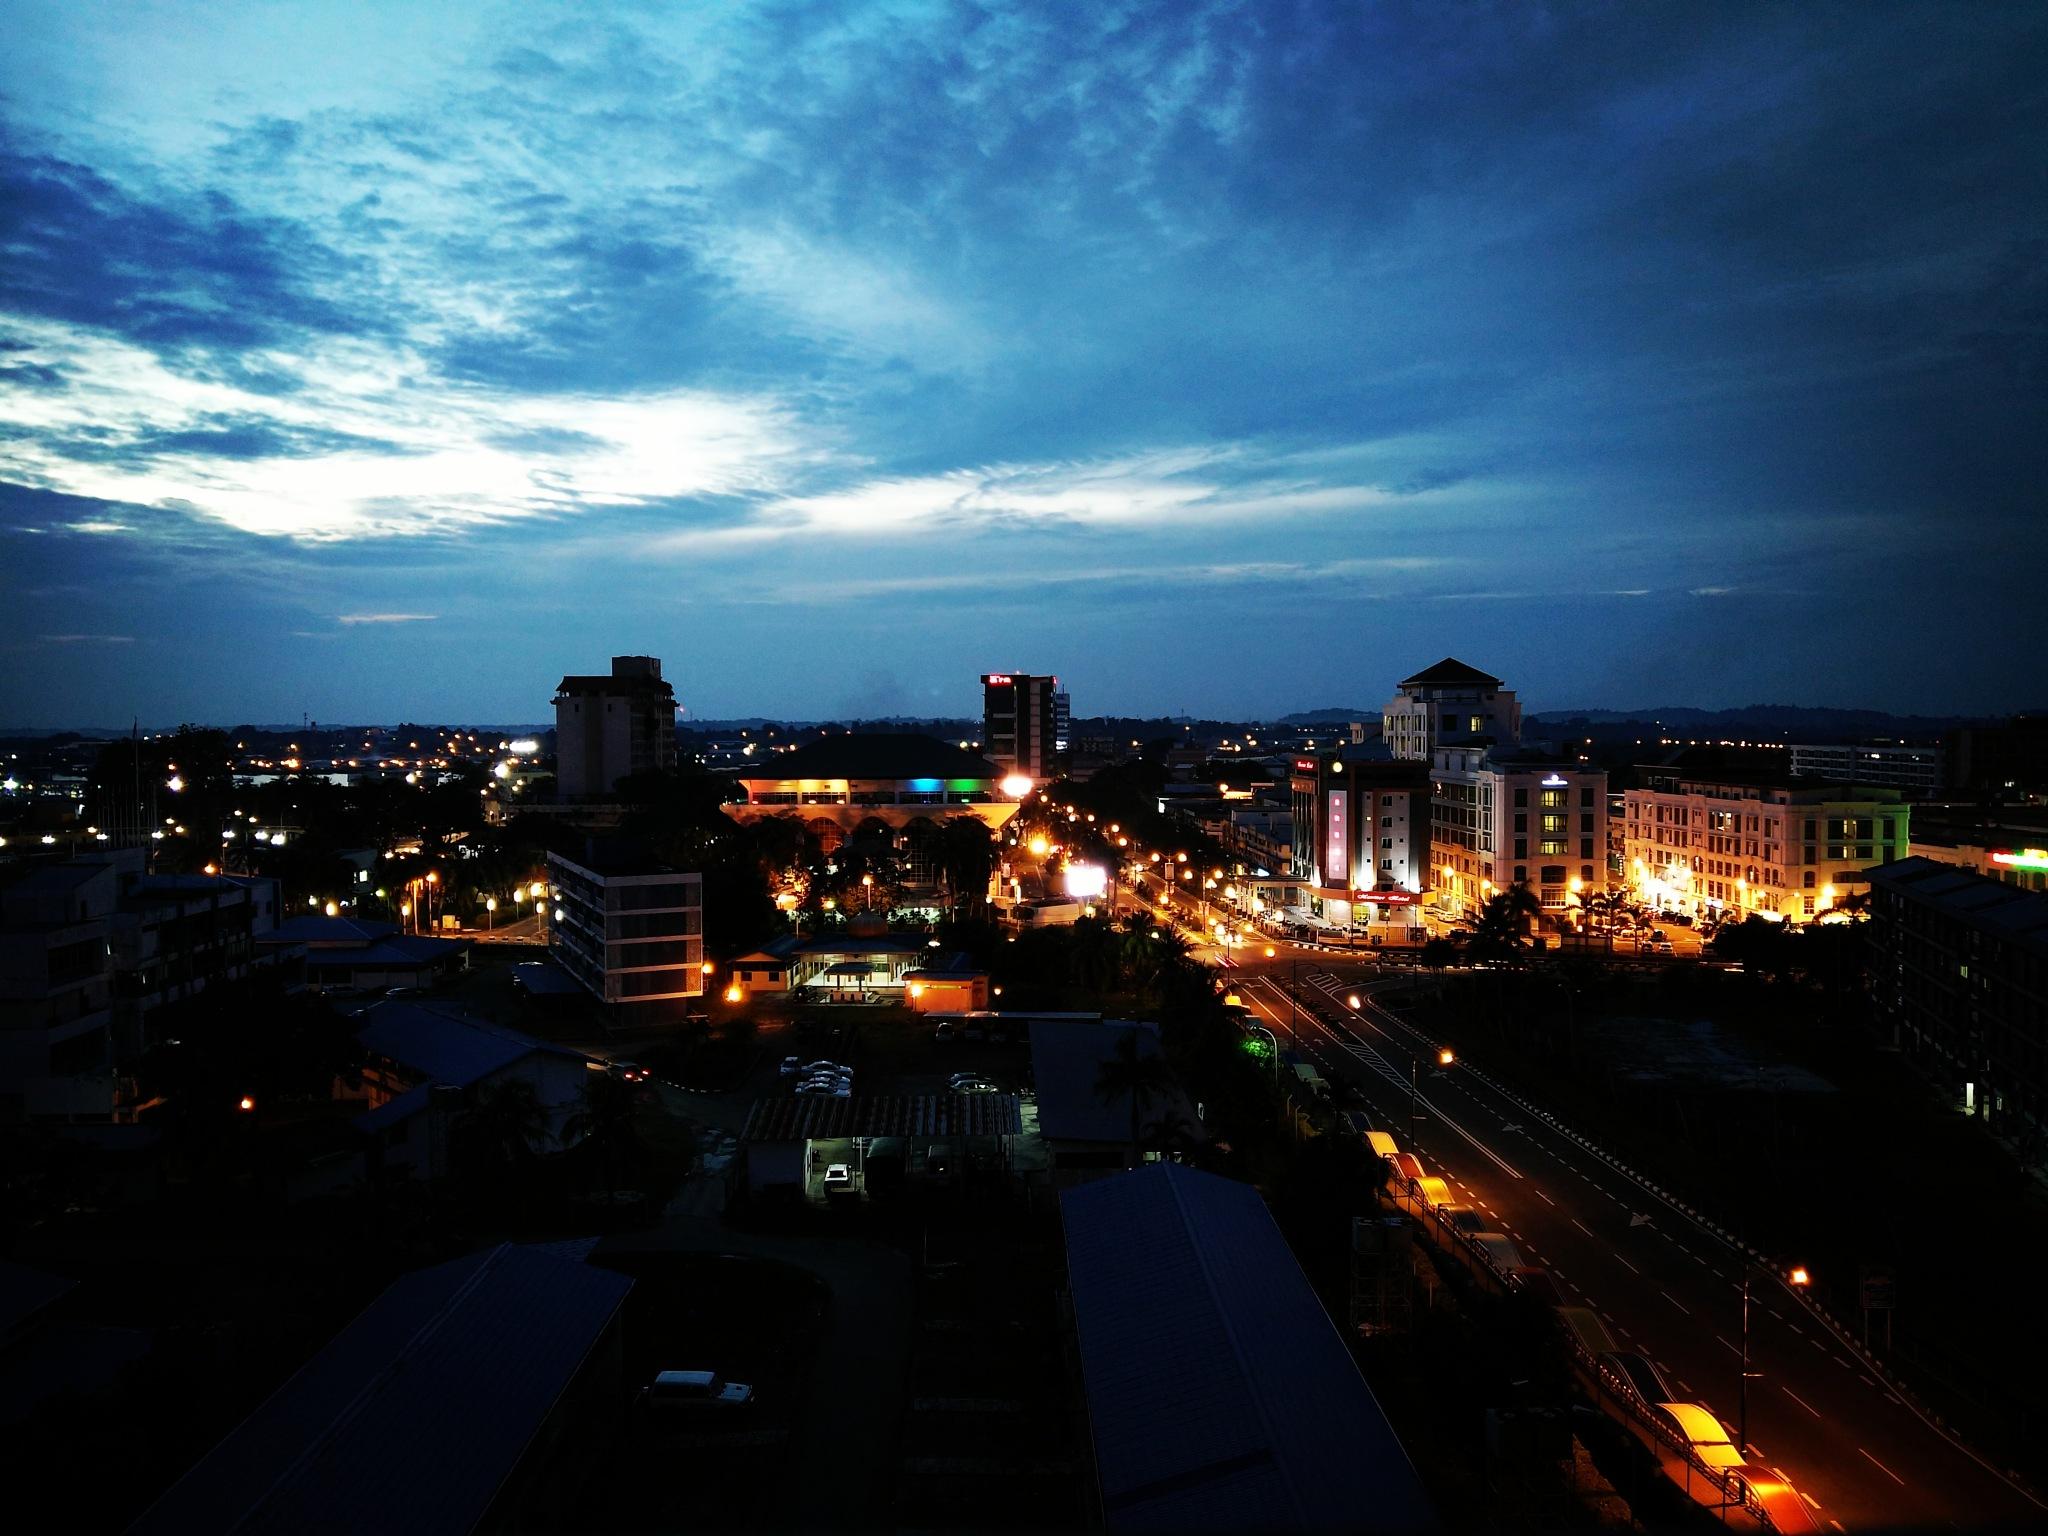 Good night Labuan by azleykassim